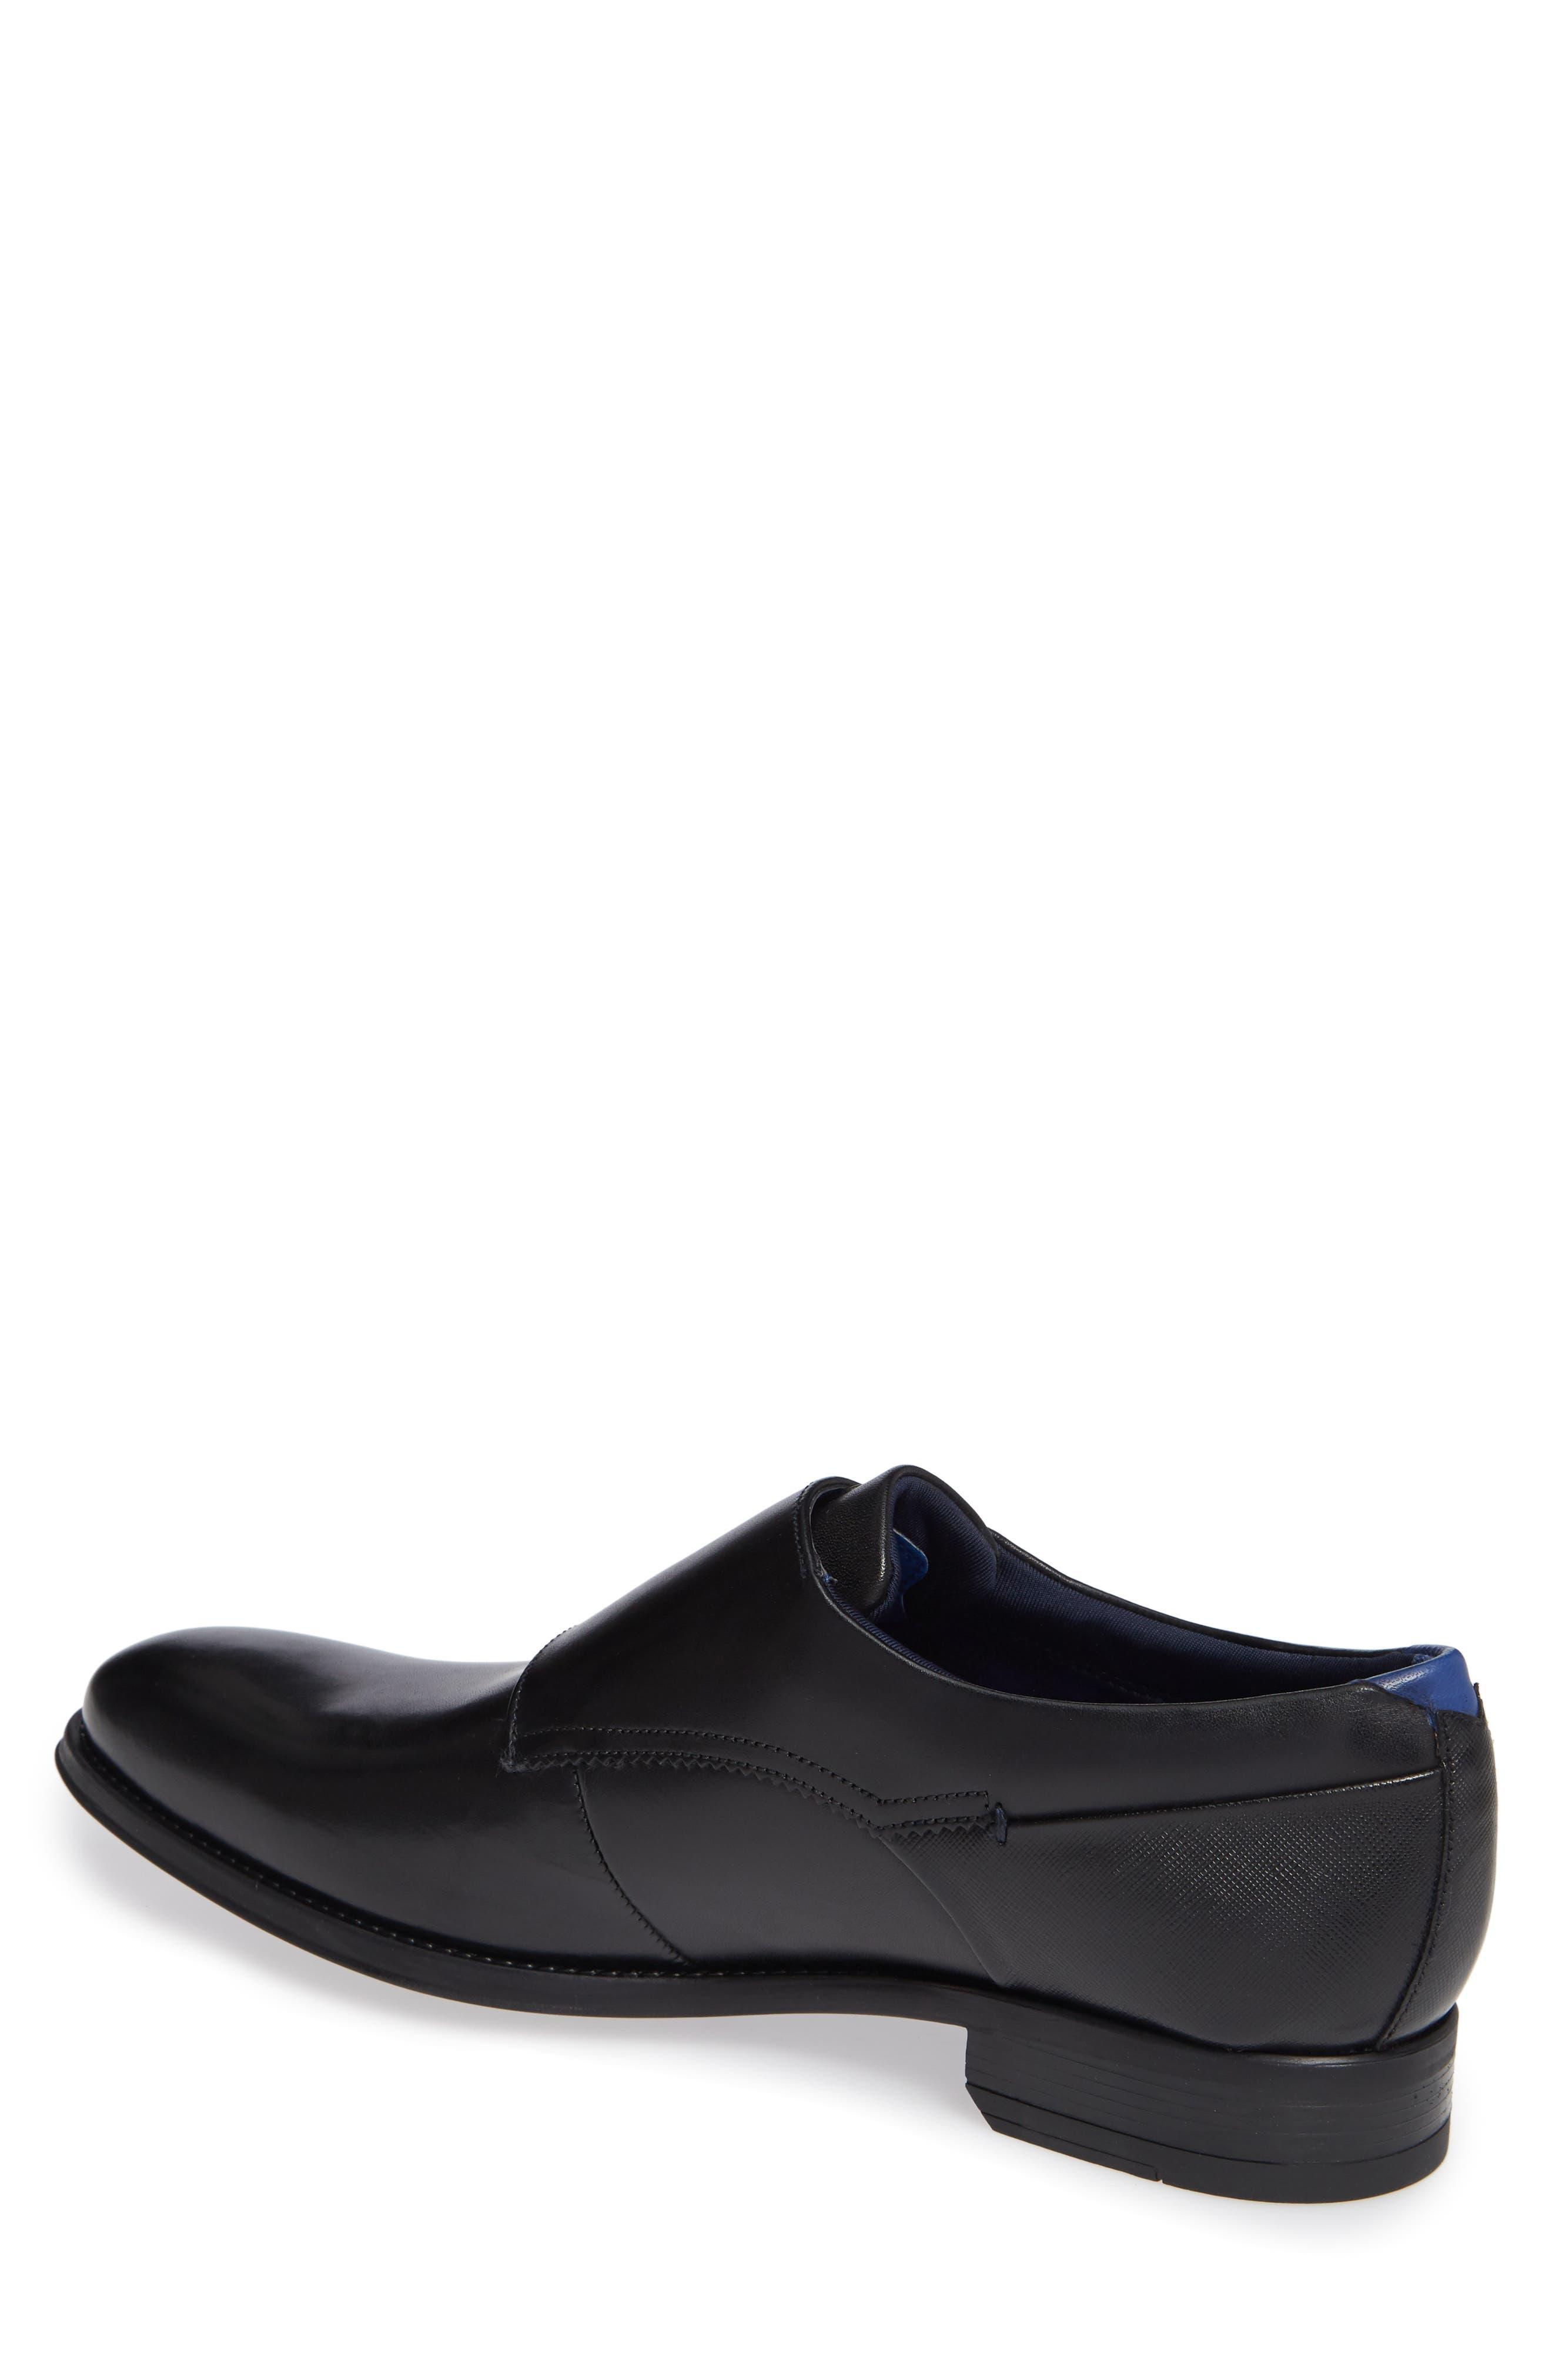 TED BAKER LONDON, Cathon Double Buckle Monk Shoe, Alternate thumbnail 2, color, BLACK LEATHER